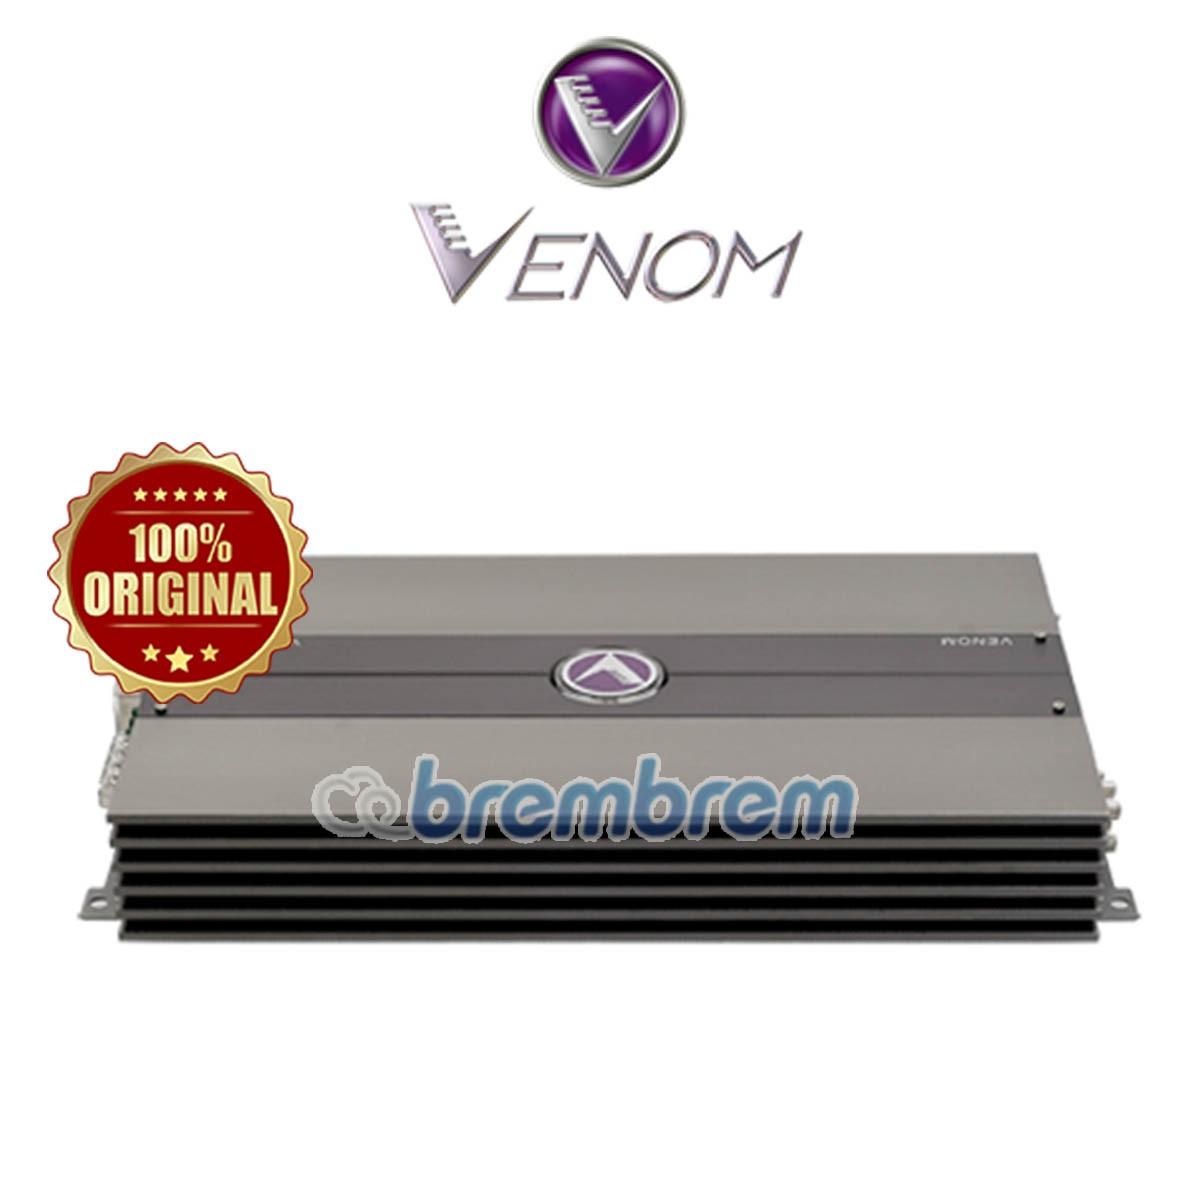 VENOM SILVER SERIES VD2600SII - POWER MONOBLOCK